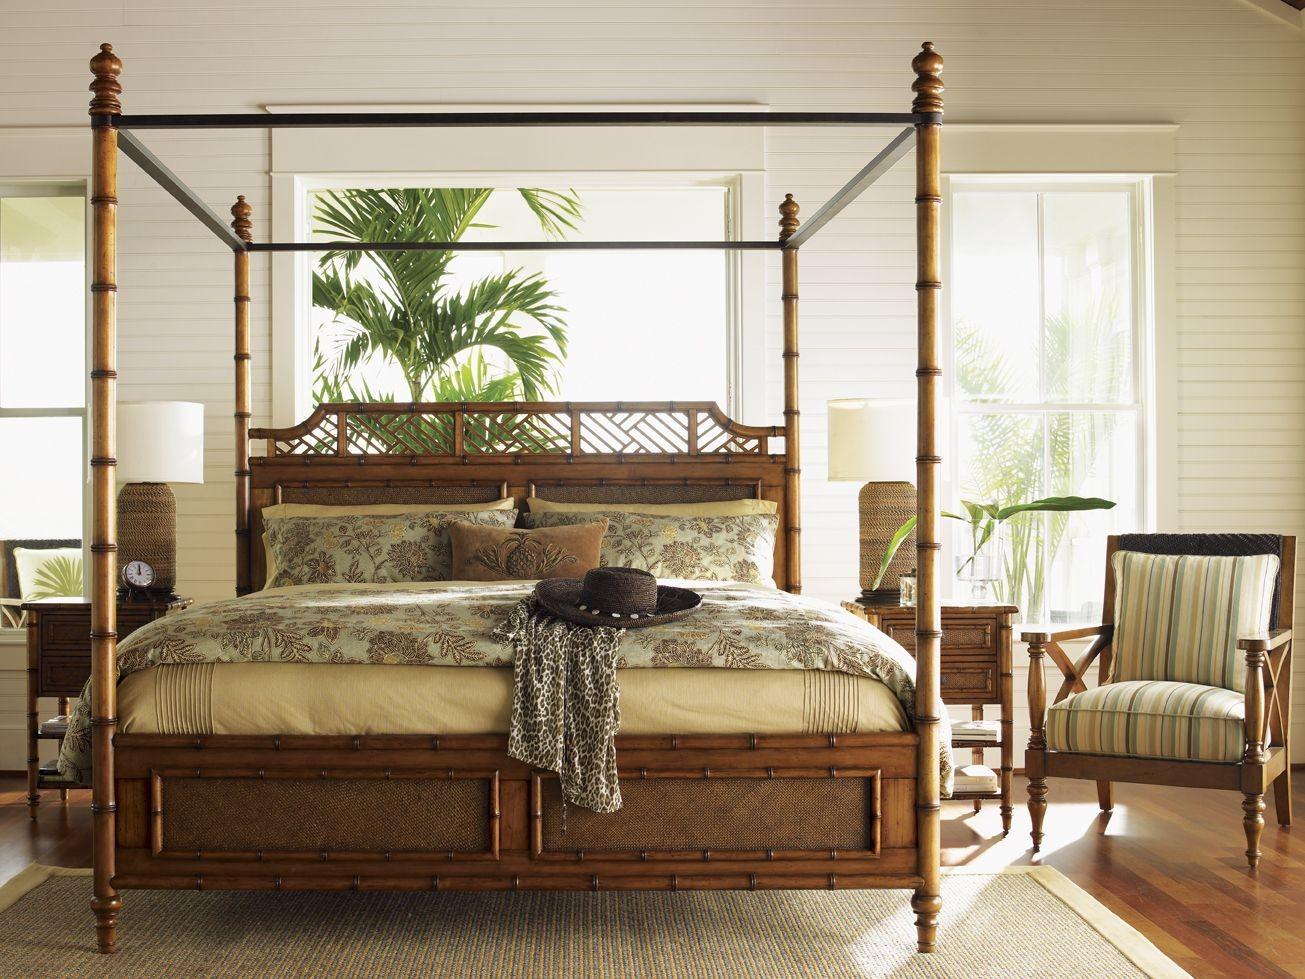 island estate plantation brown west indies canopy bedroom